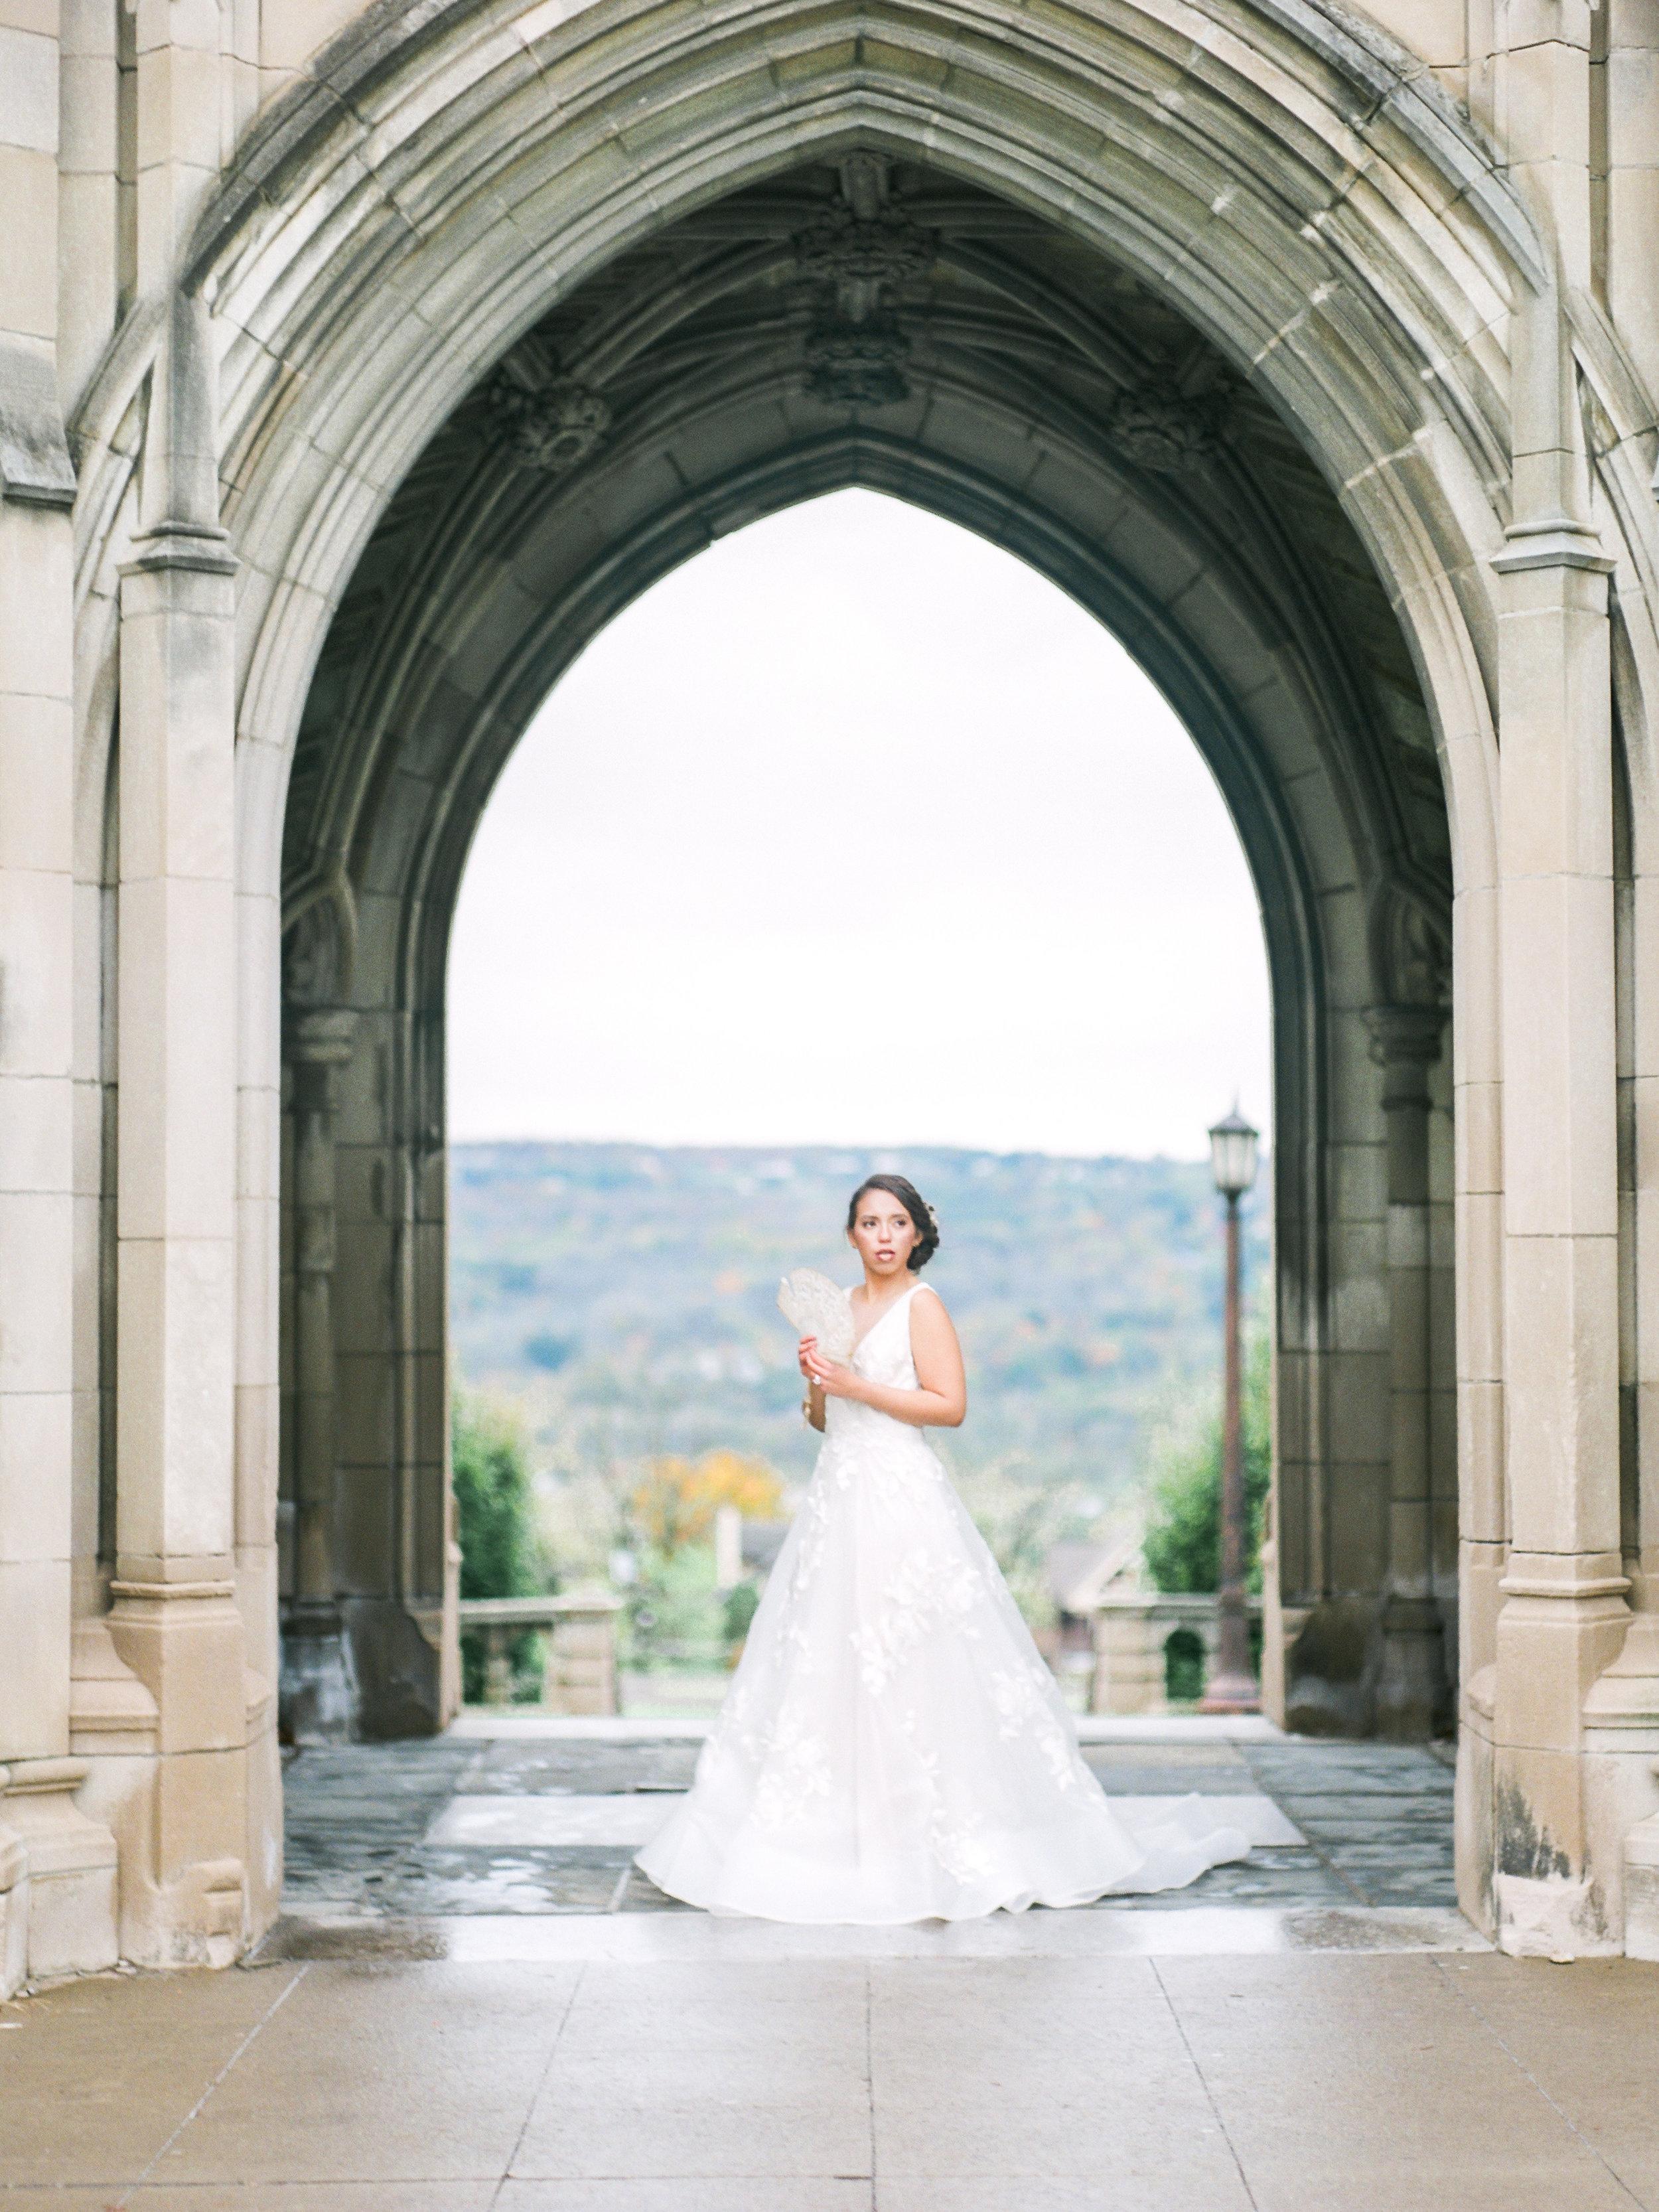 Ithaca New York-Brides Story-Manda Weaver-Wedding-60.jpg